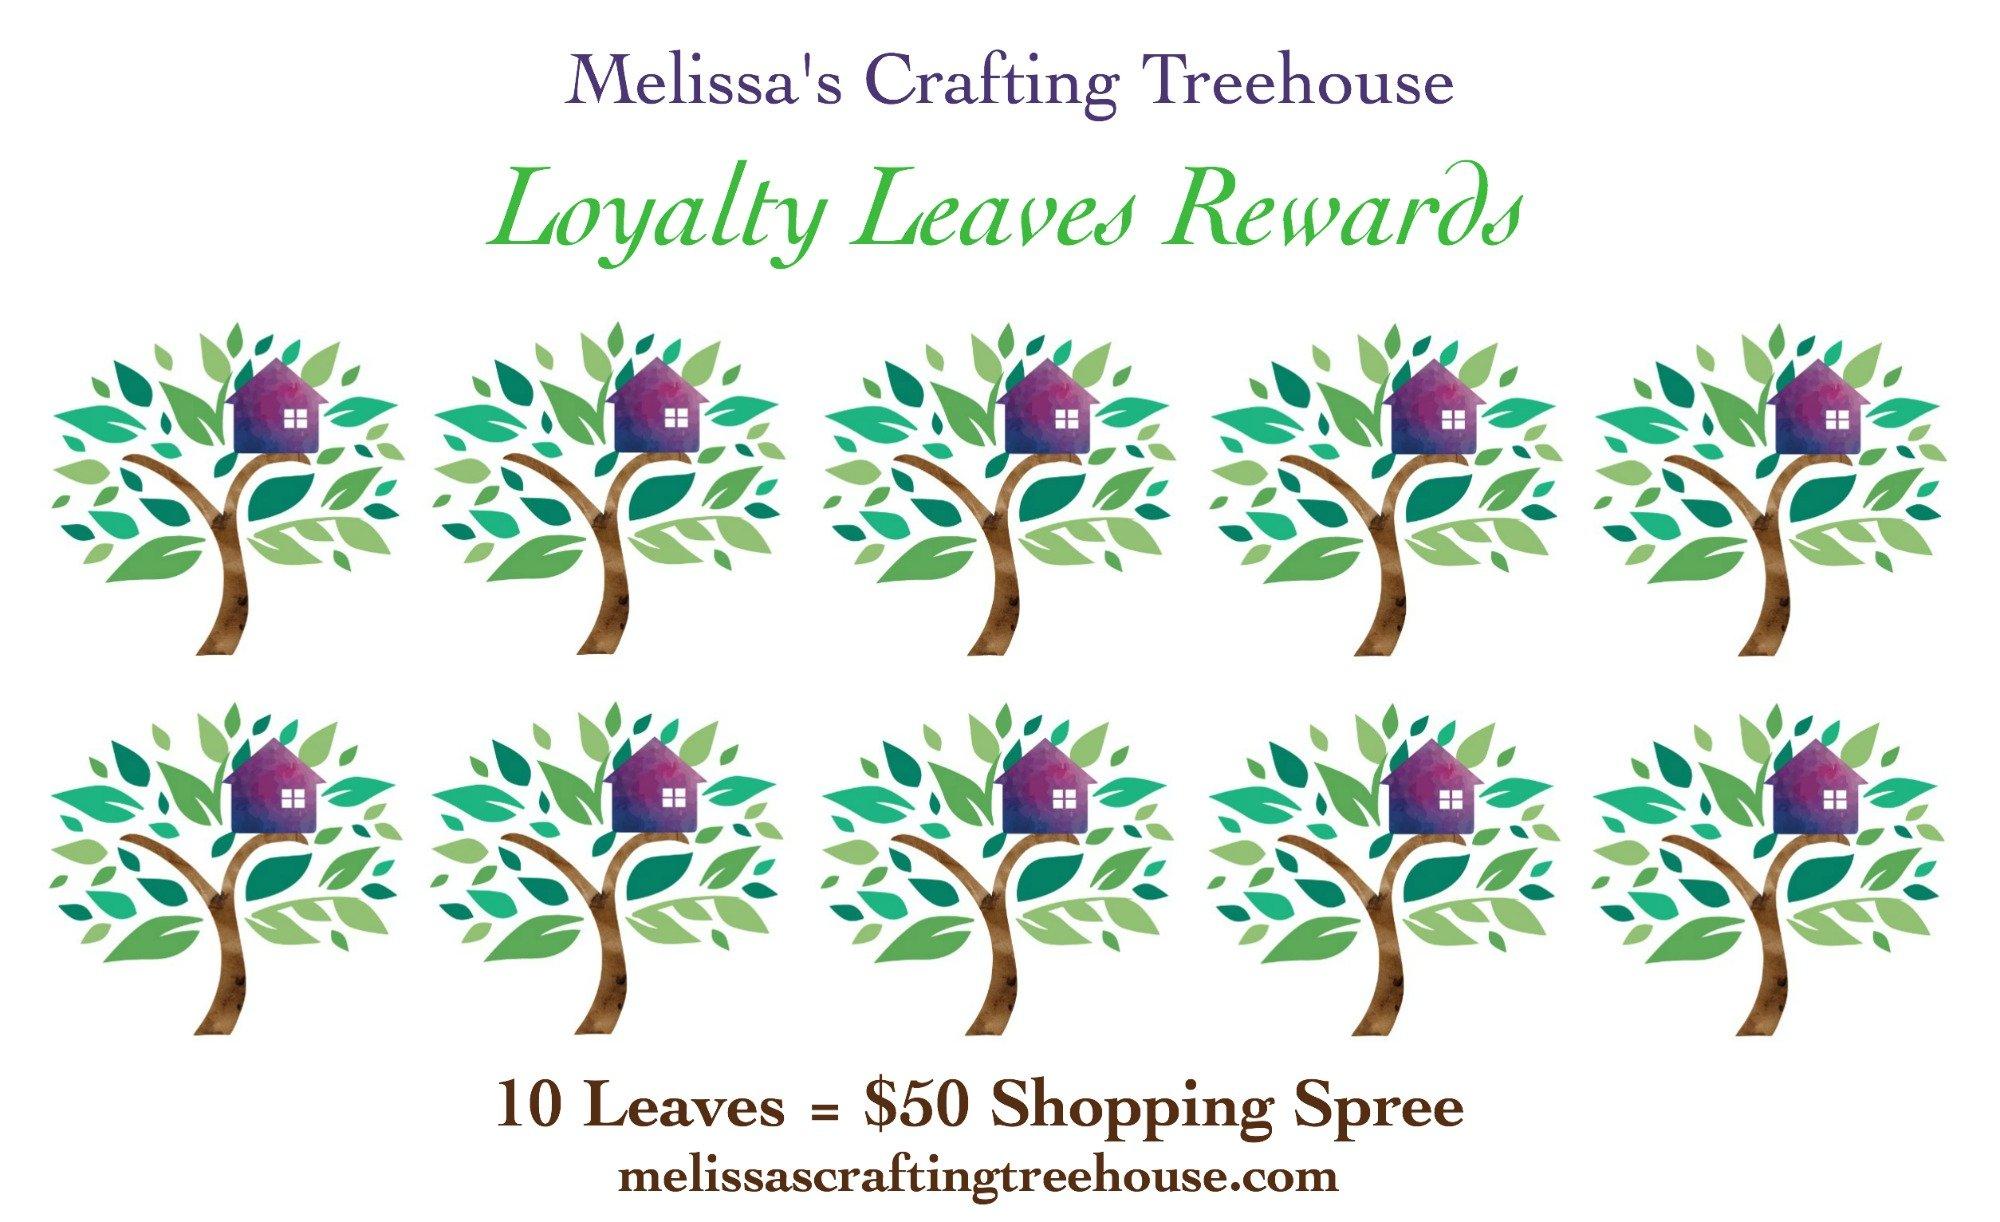 Melissa's Crafting Treehouse Loyalty Leaves Customer Rewards Program